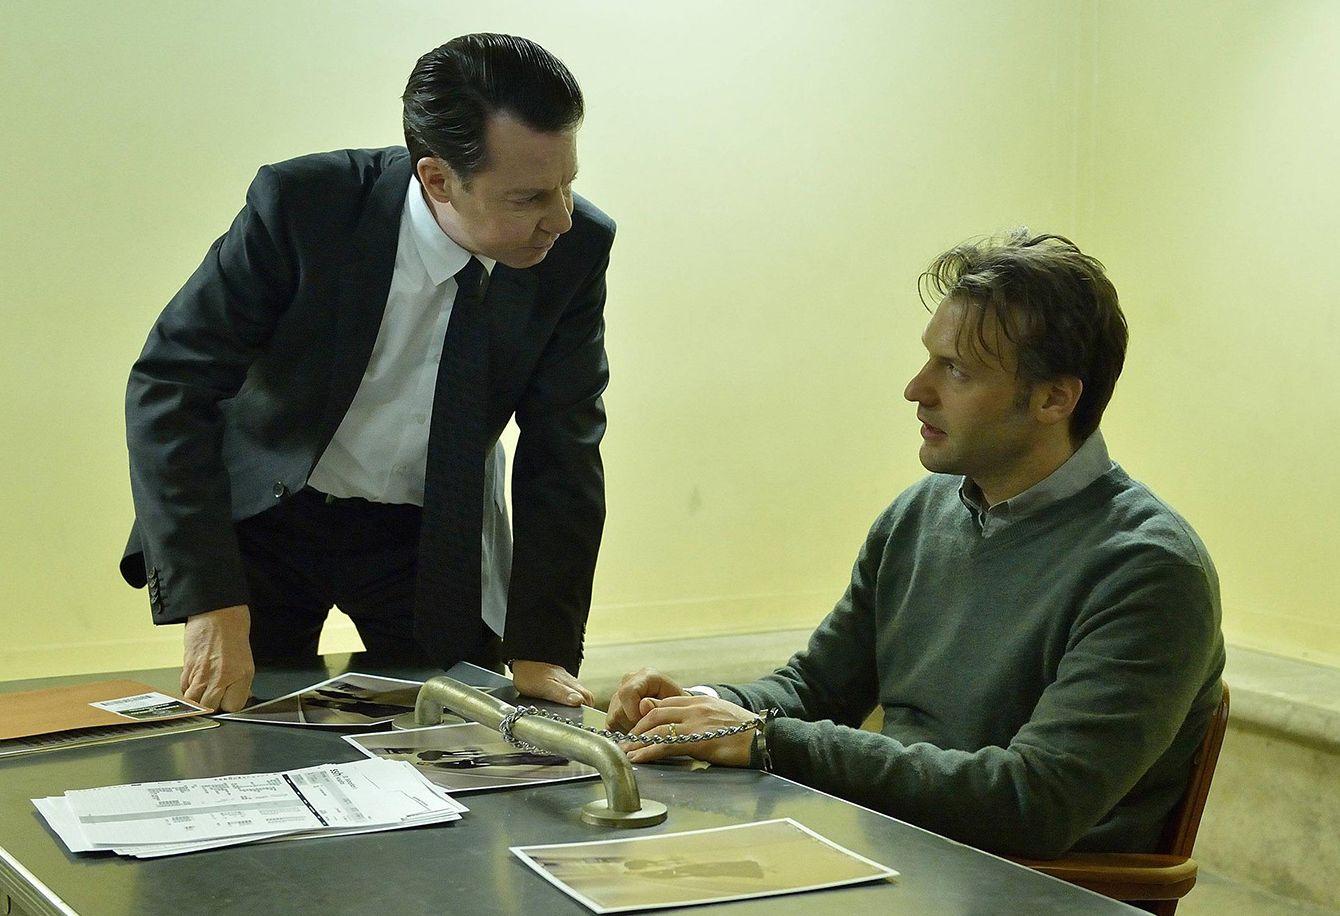 Eph (Corey Stoll) under investigation at the FBI